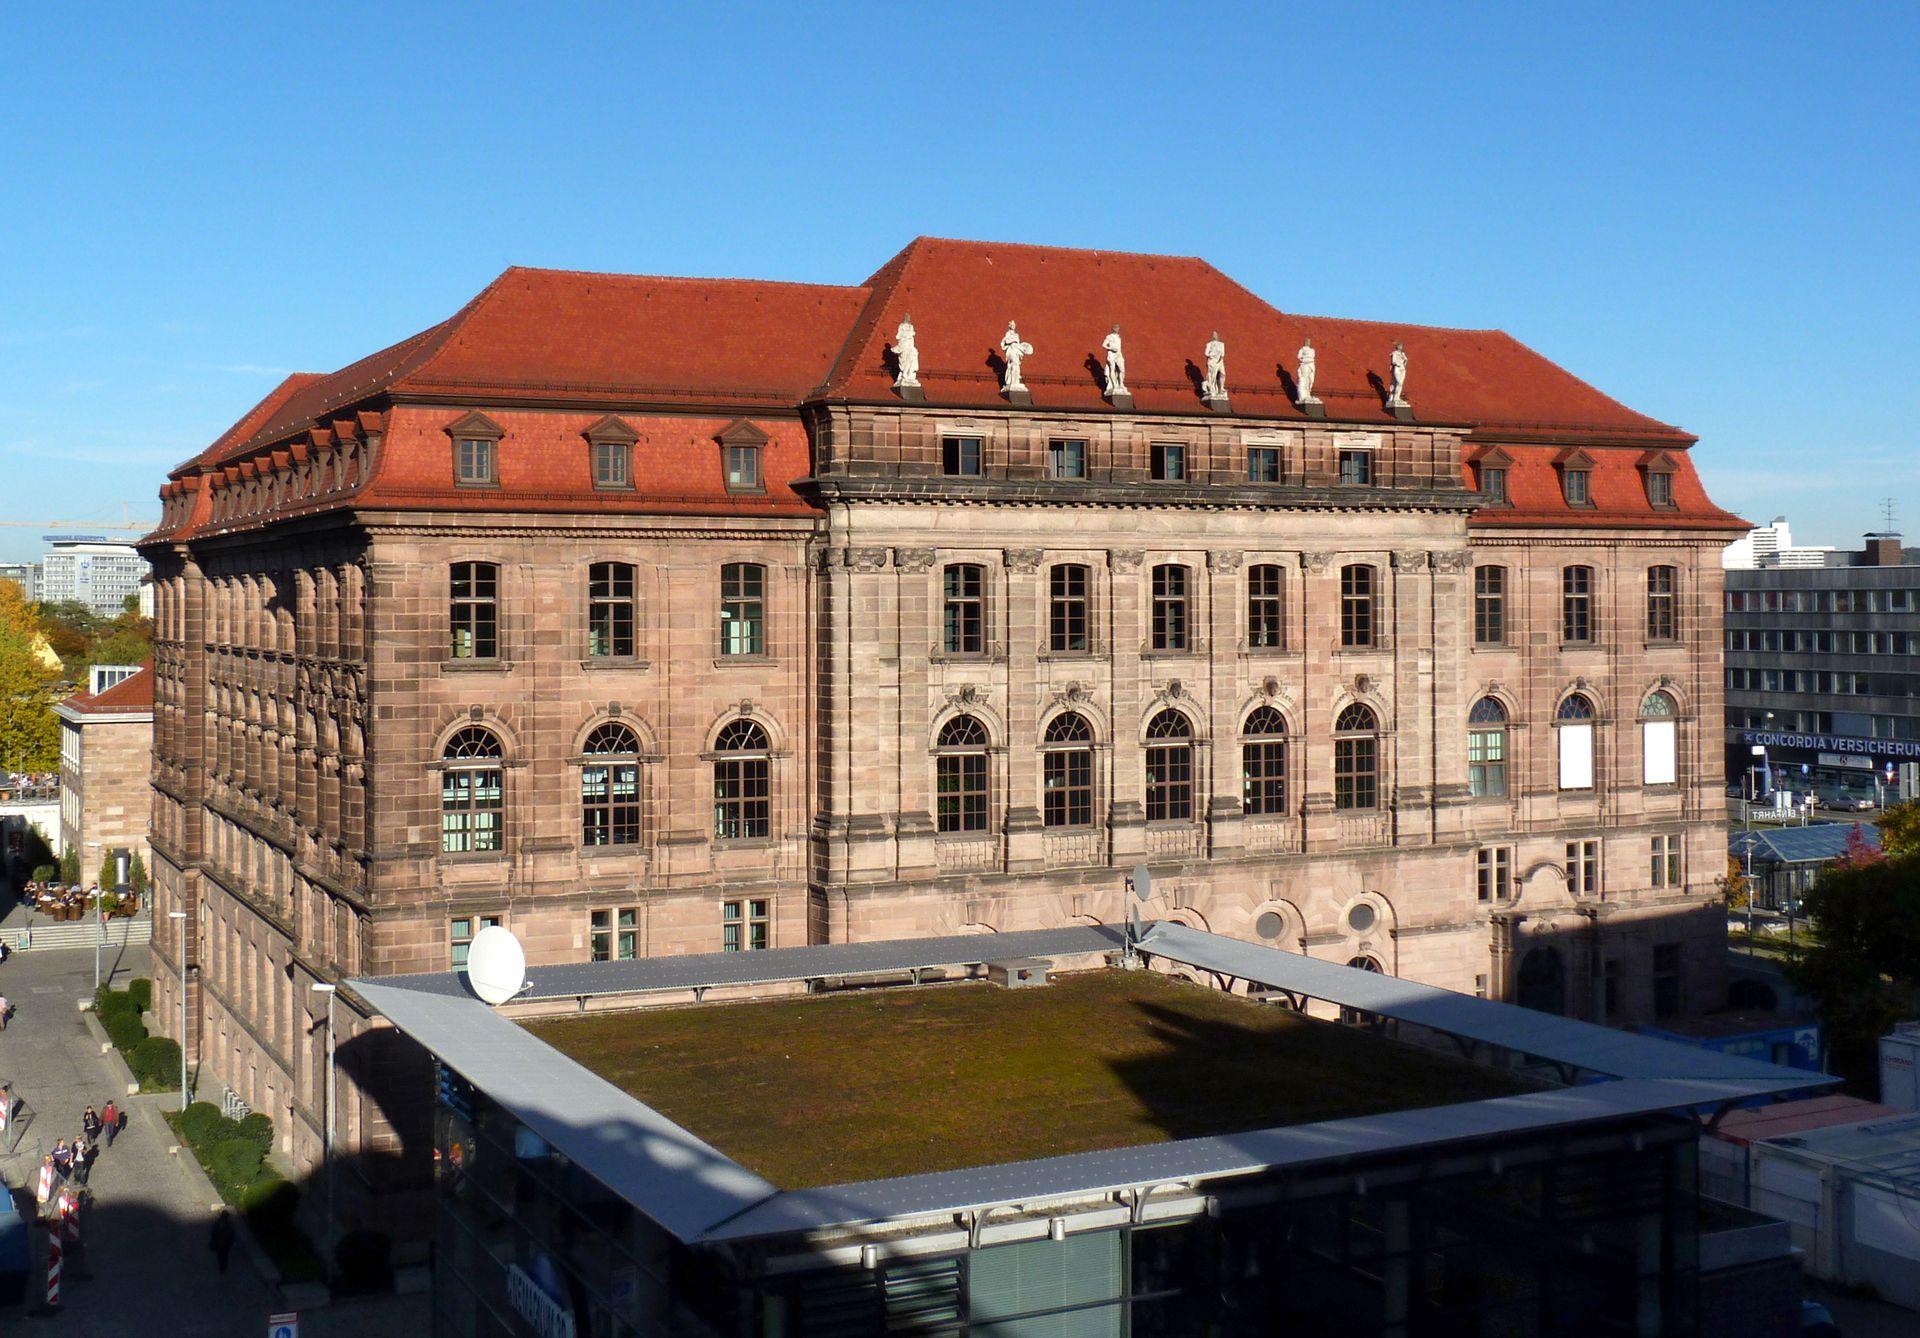 Former Bavarian Trade and Business Institute (Landesgewerbeanstalt) Southwest front